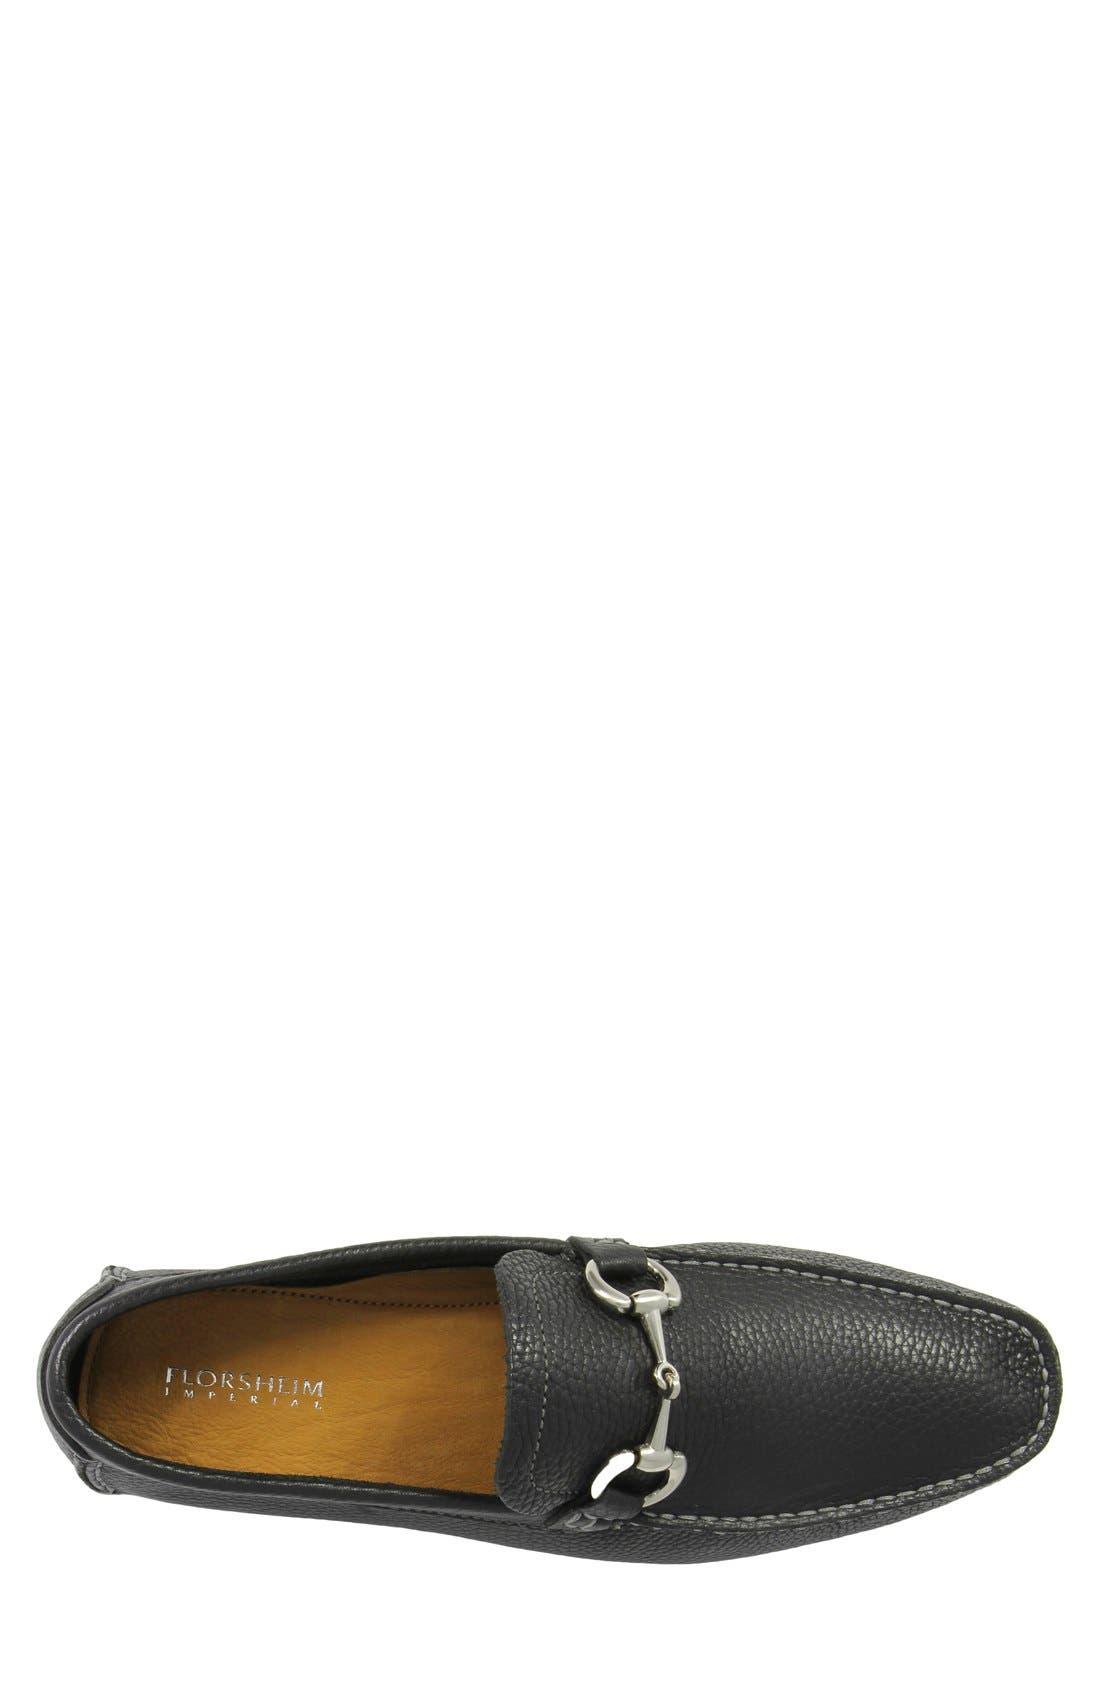 'Danforth' Driving Shoe,                             Alternate thumbnail 3, color,                             BLACK LEATHER